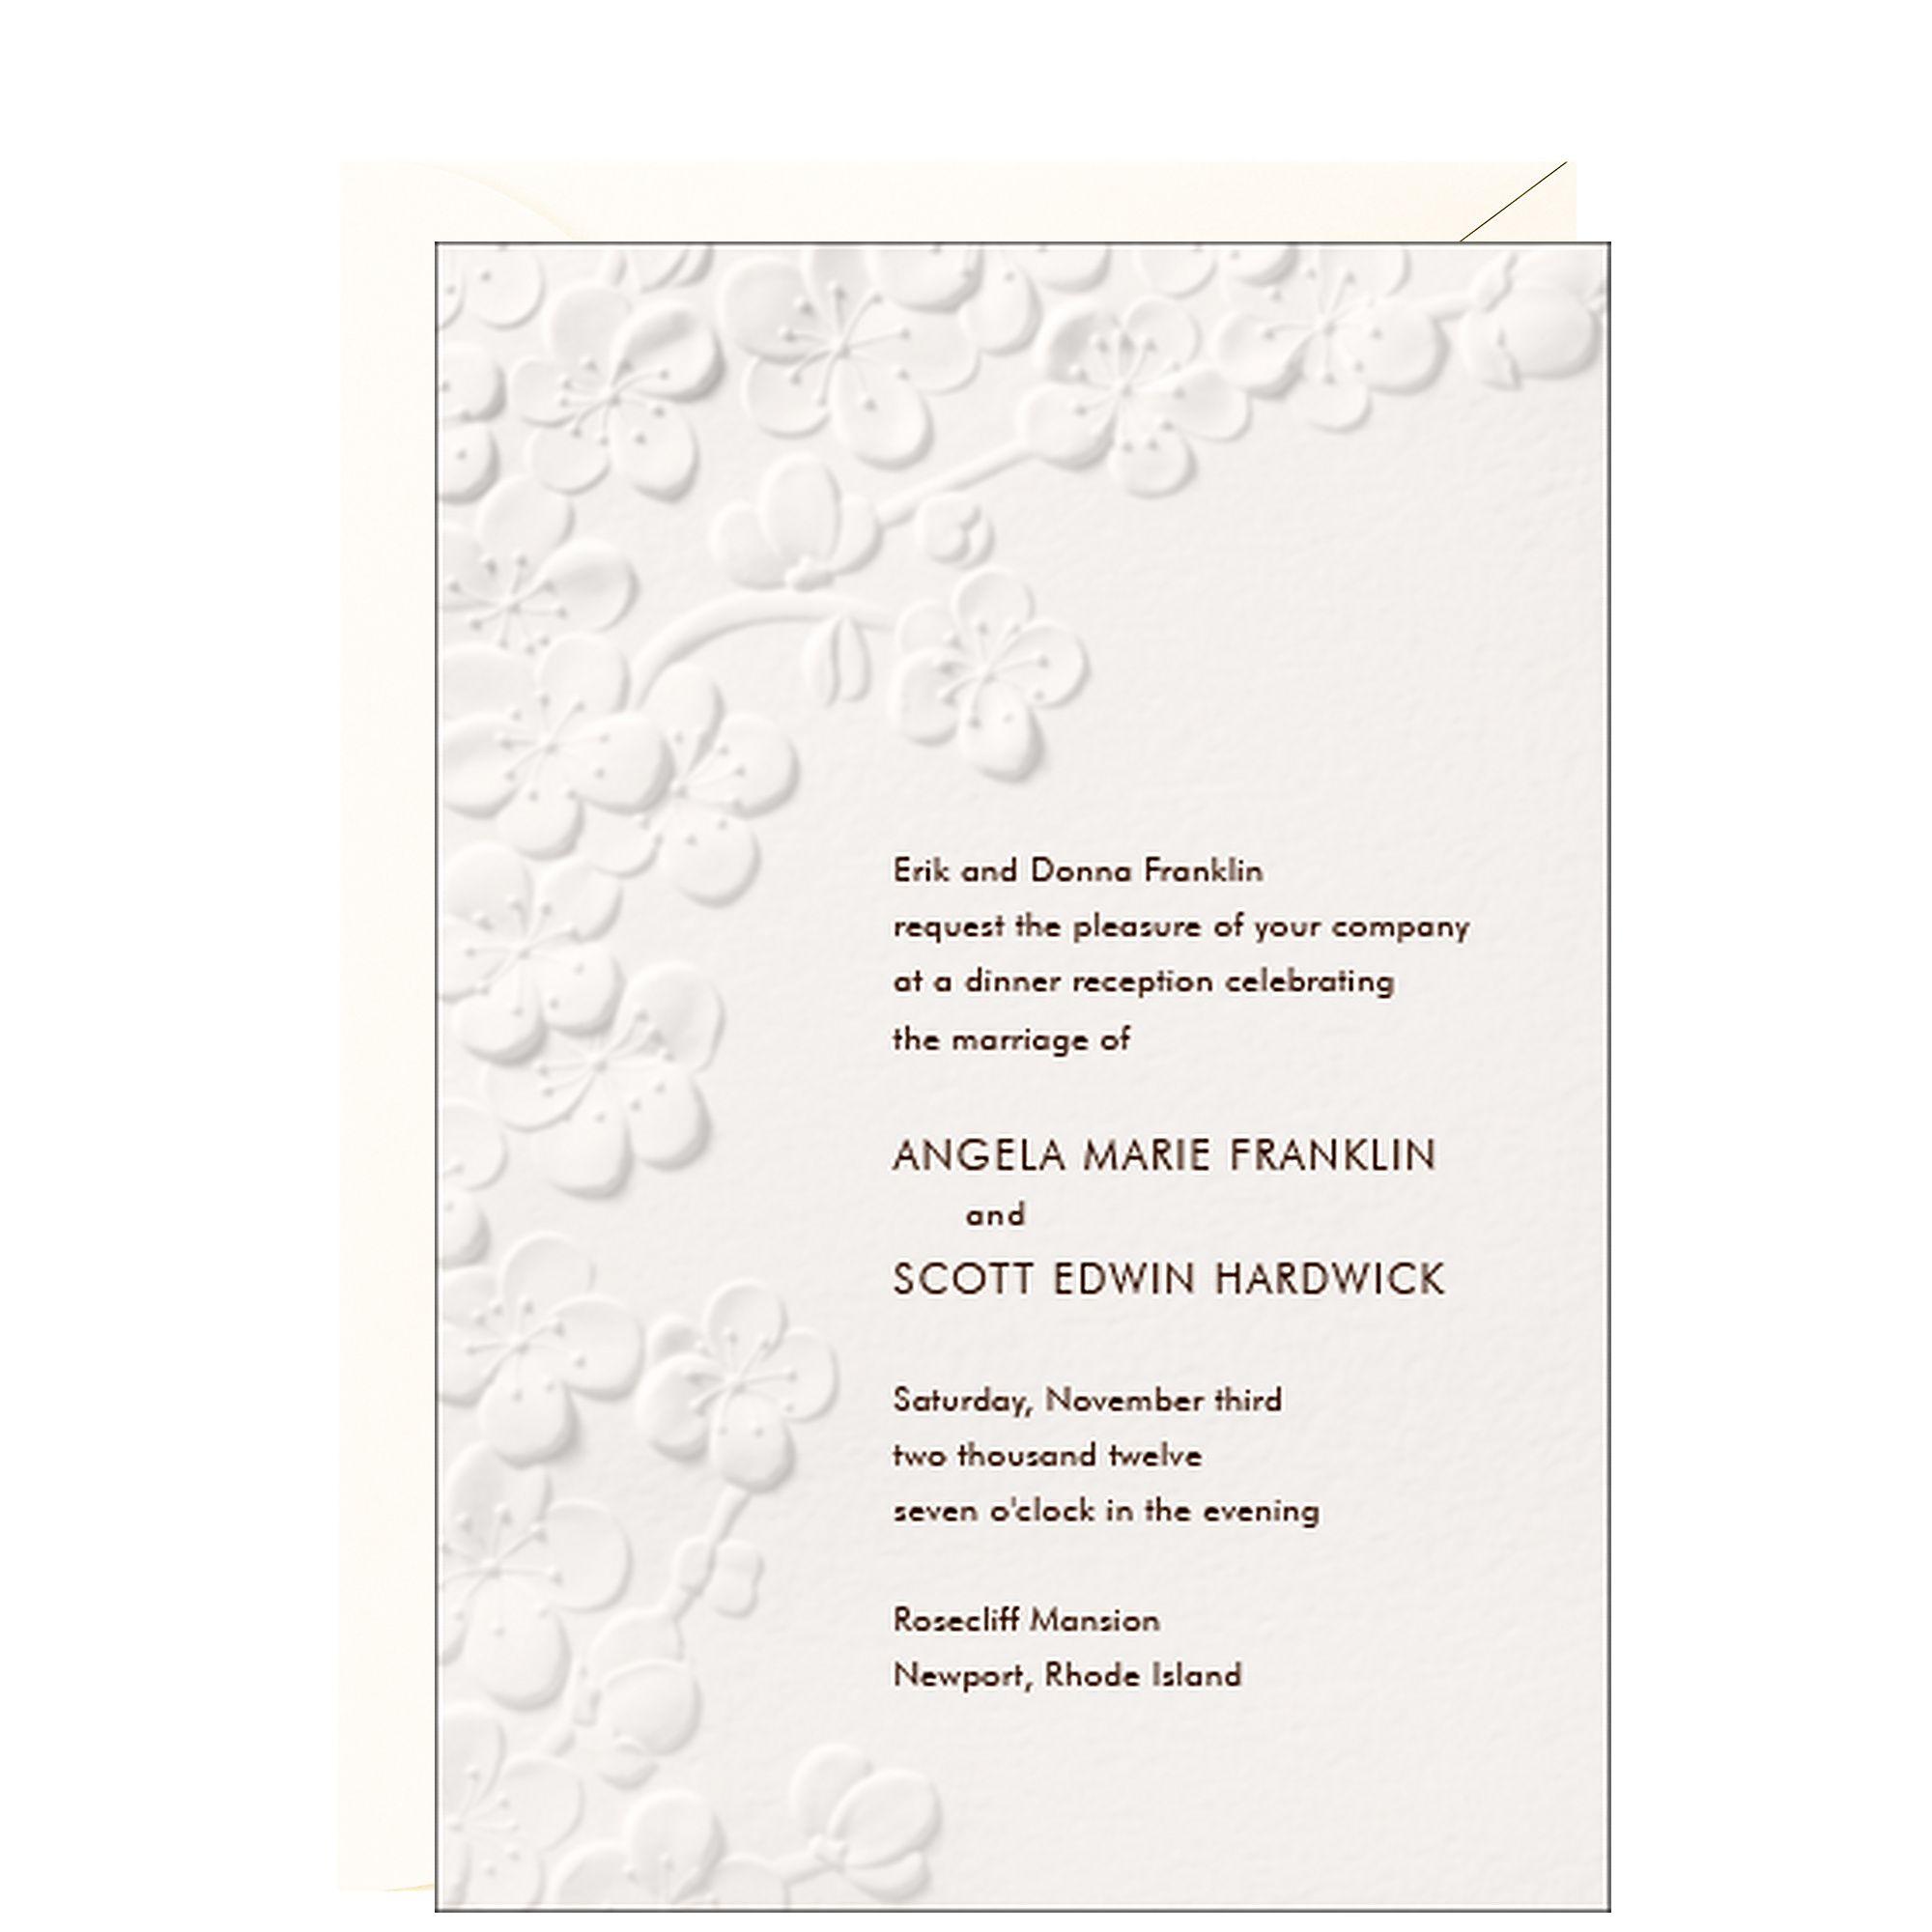 Cherry Blossom Embossed Wedding Invitation | Invitations ...